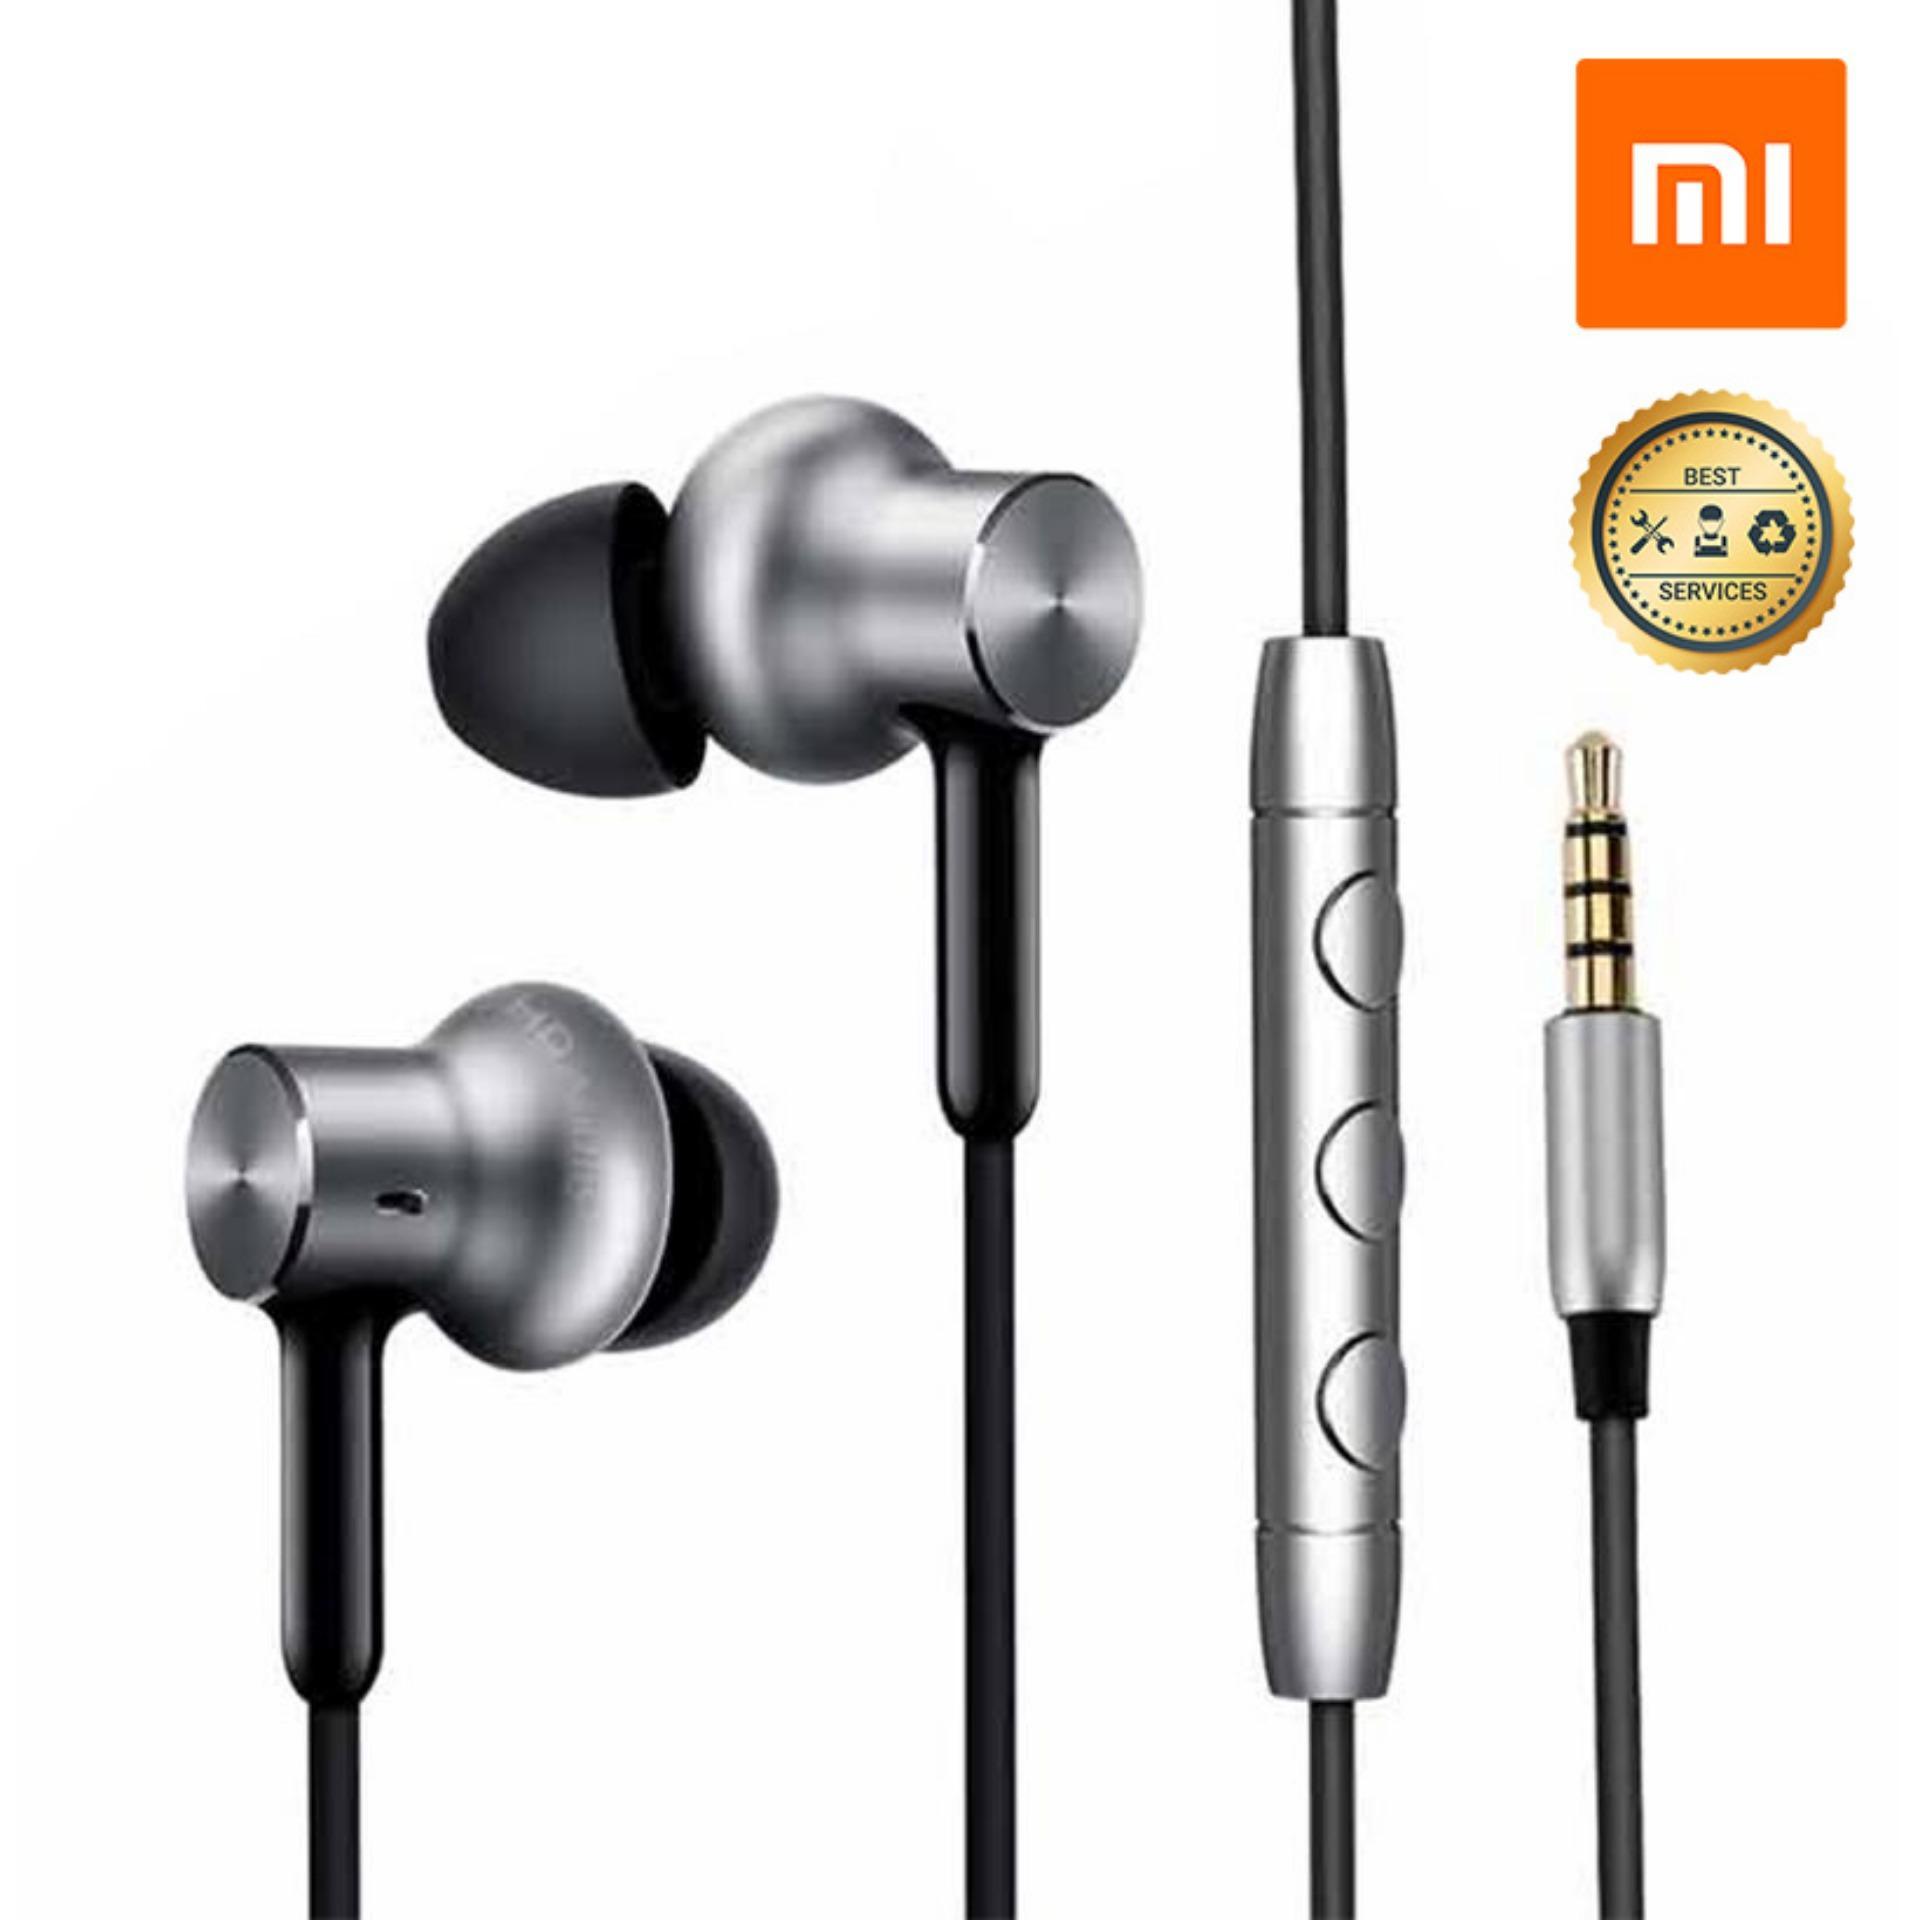 Tai nghe Xiaomi Mi In-Ear Headphones Pro HD (Bạc)